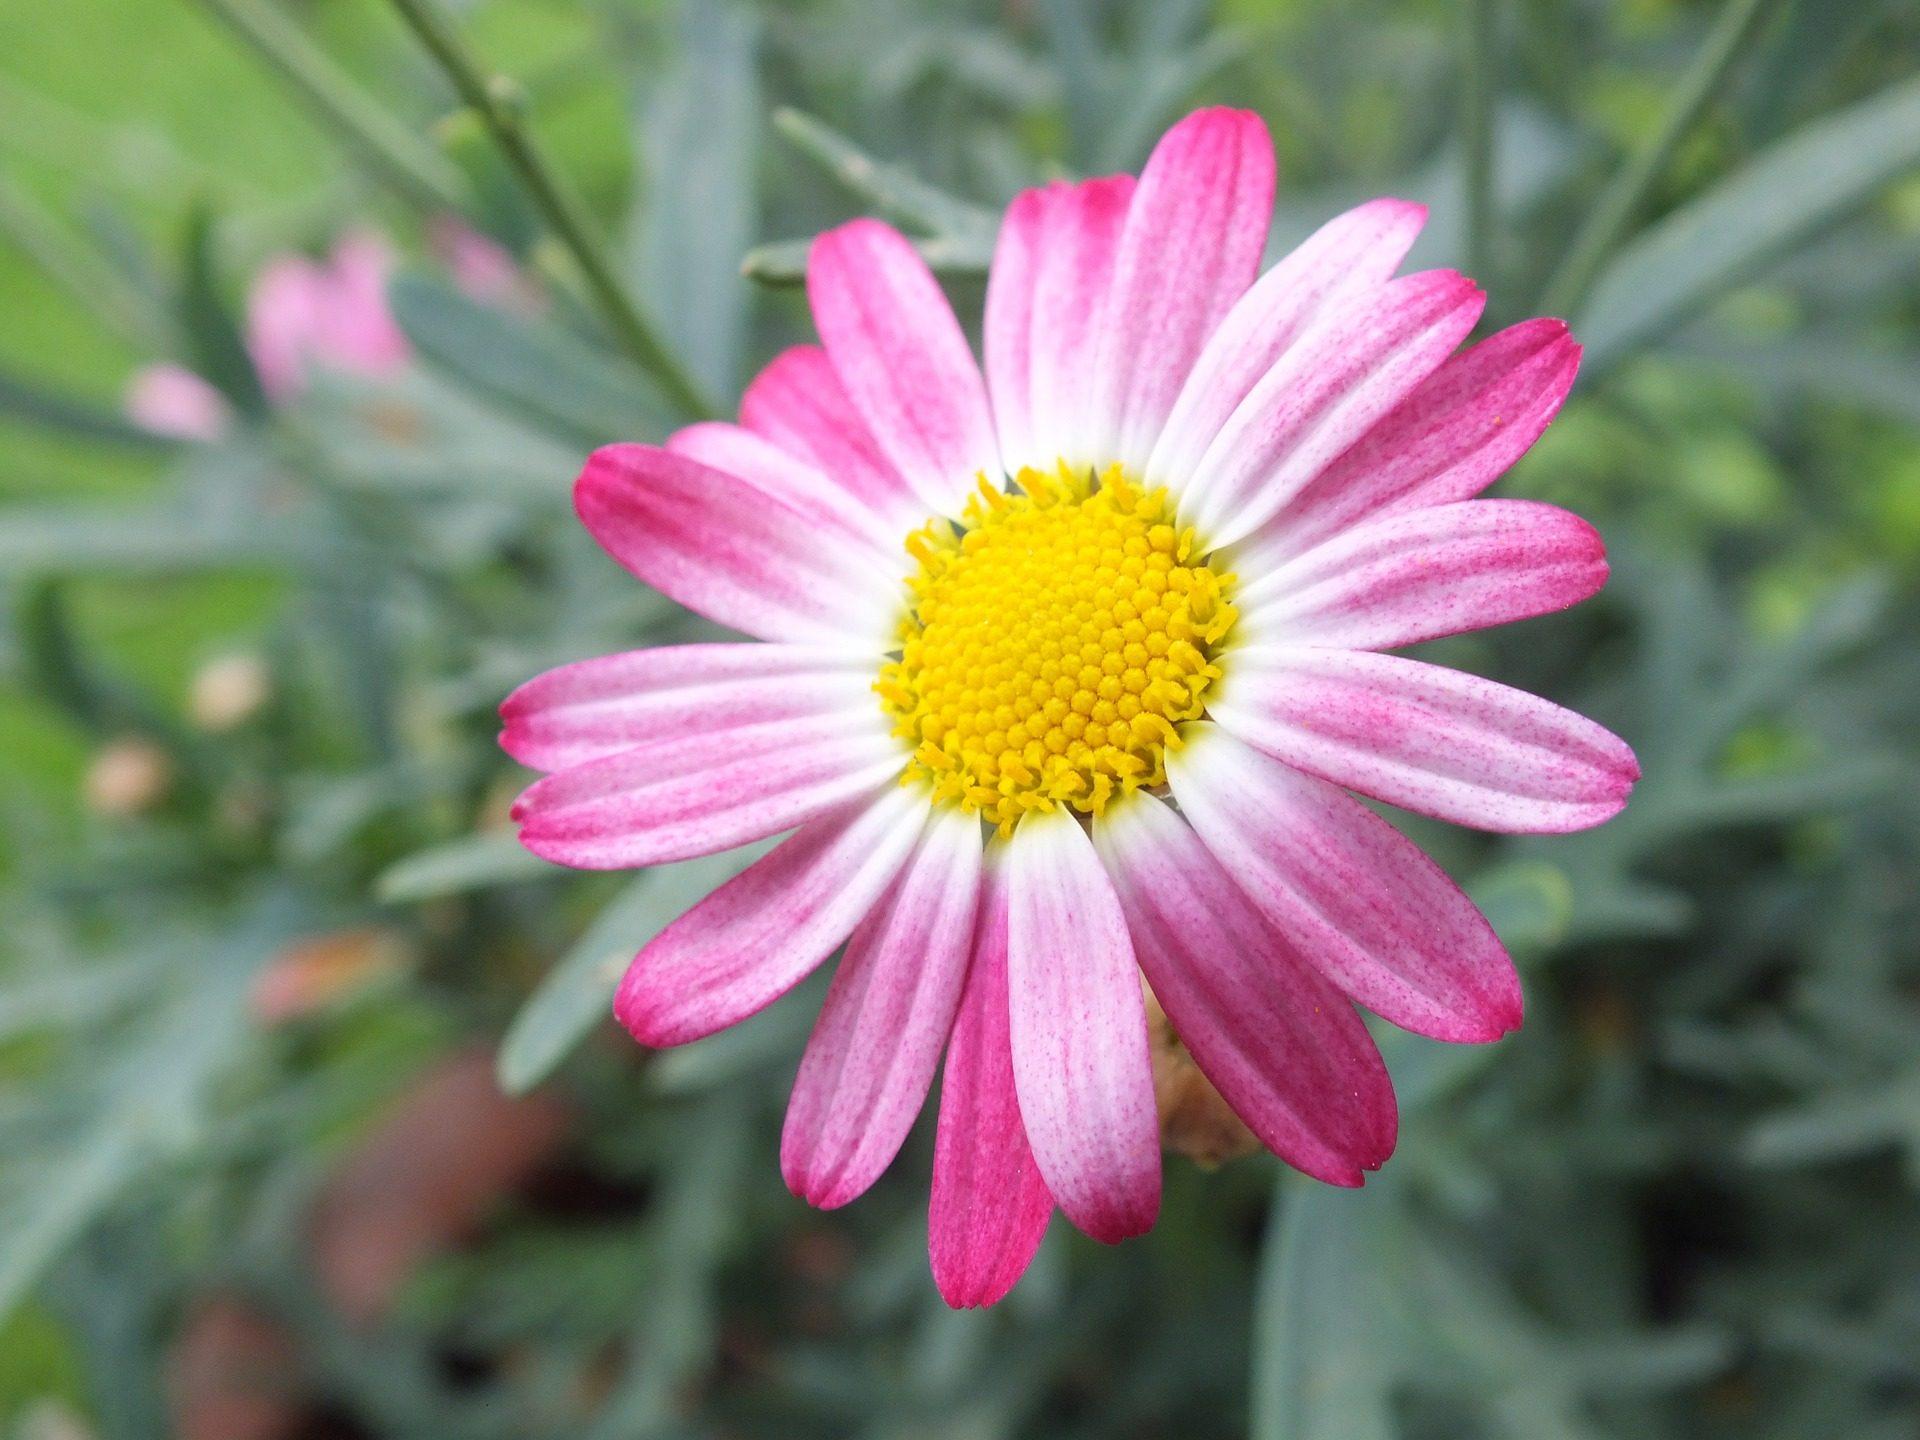 Margarita, fiore, petali di, Jardín, Floración, Rosa - Sfondi HD - Professor-falken.com